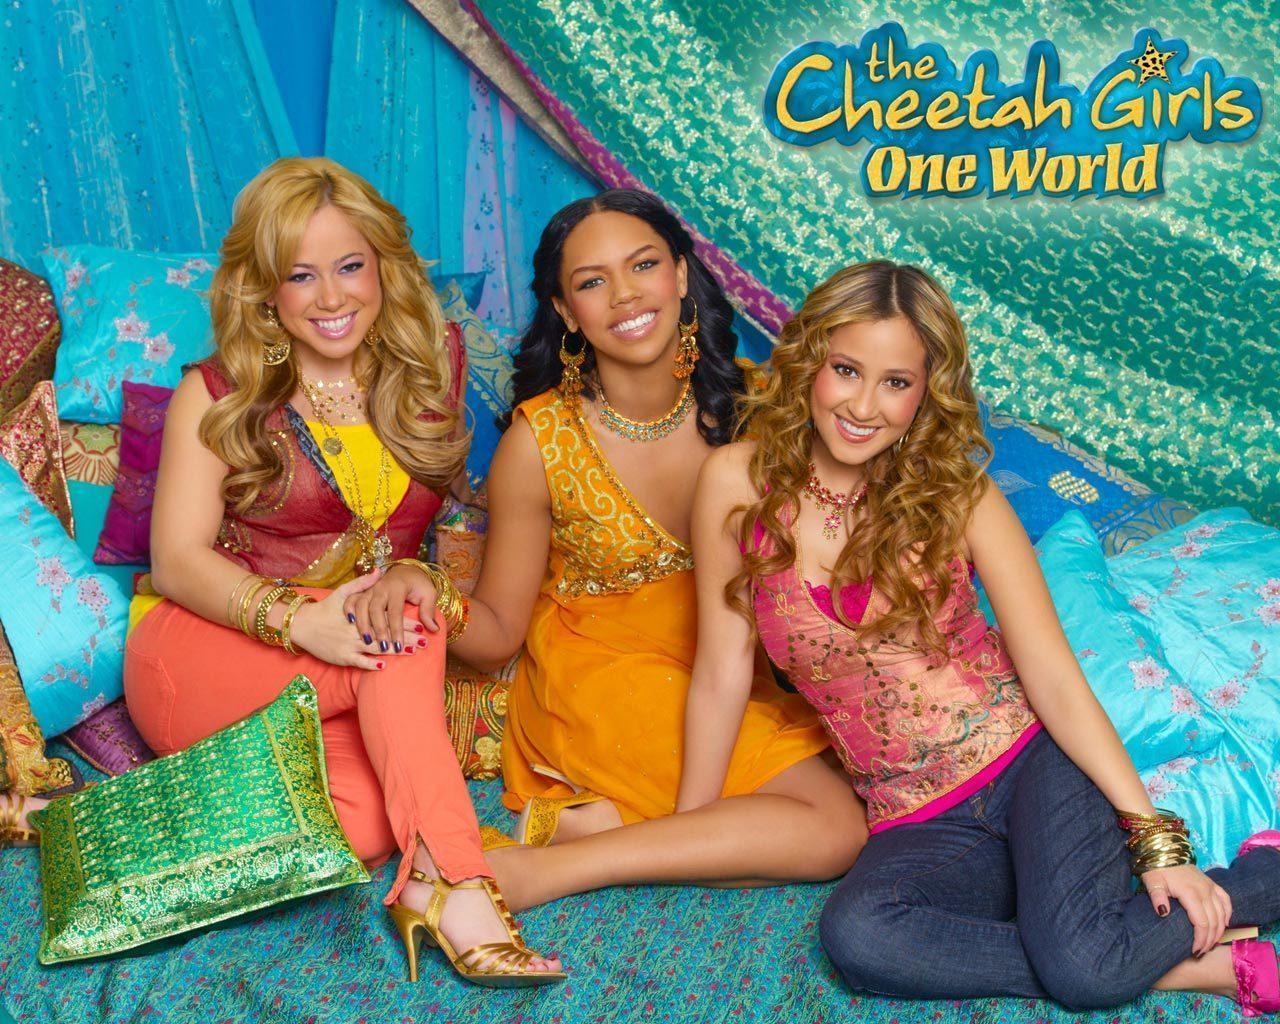 Cheetah girl one word